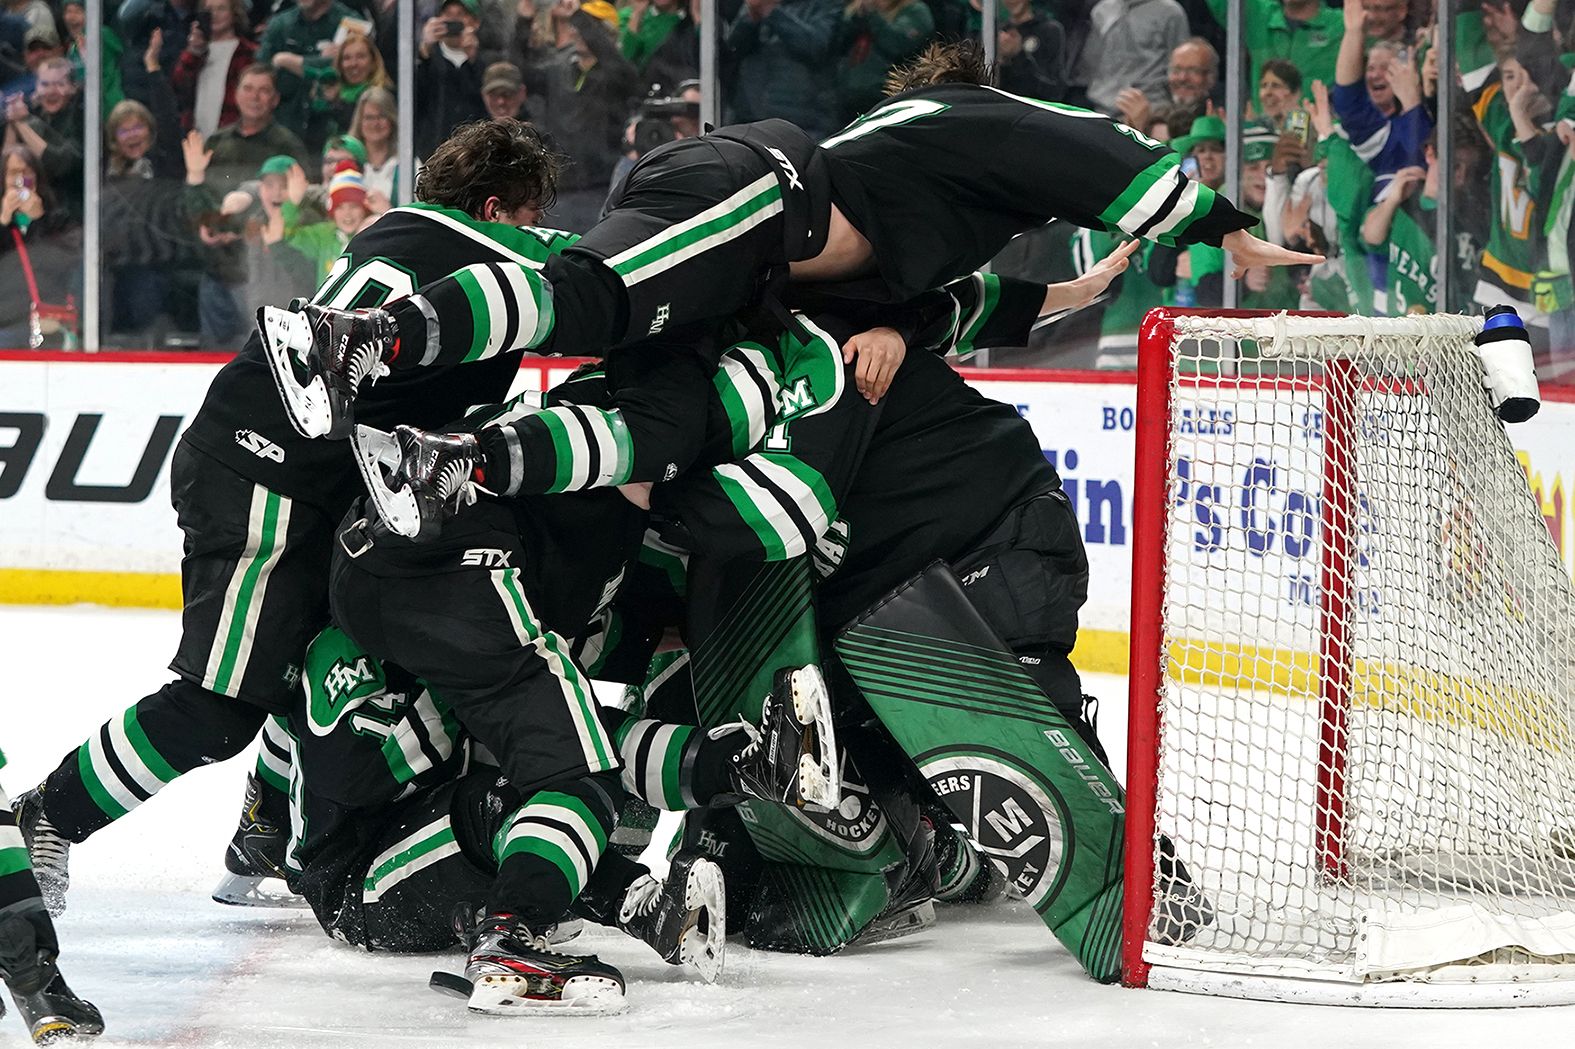 2020-03-07 EP Boys Hockey vs Hill Murray RSO07689 1.6 MB